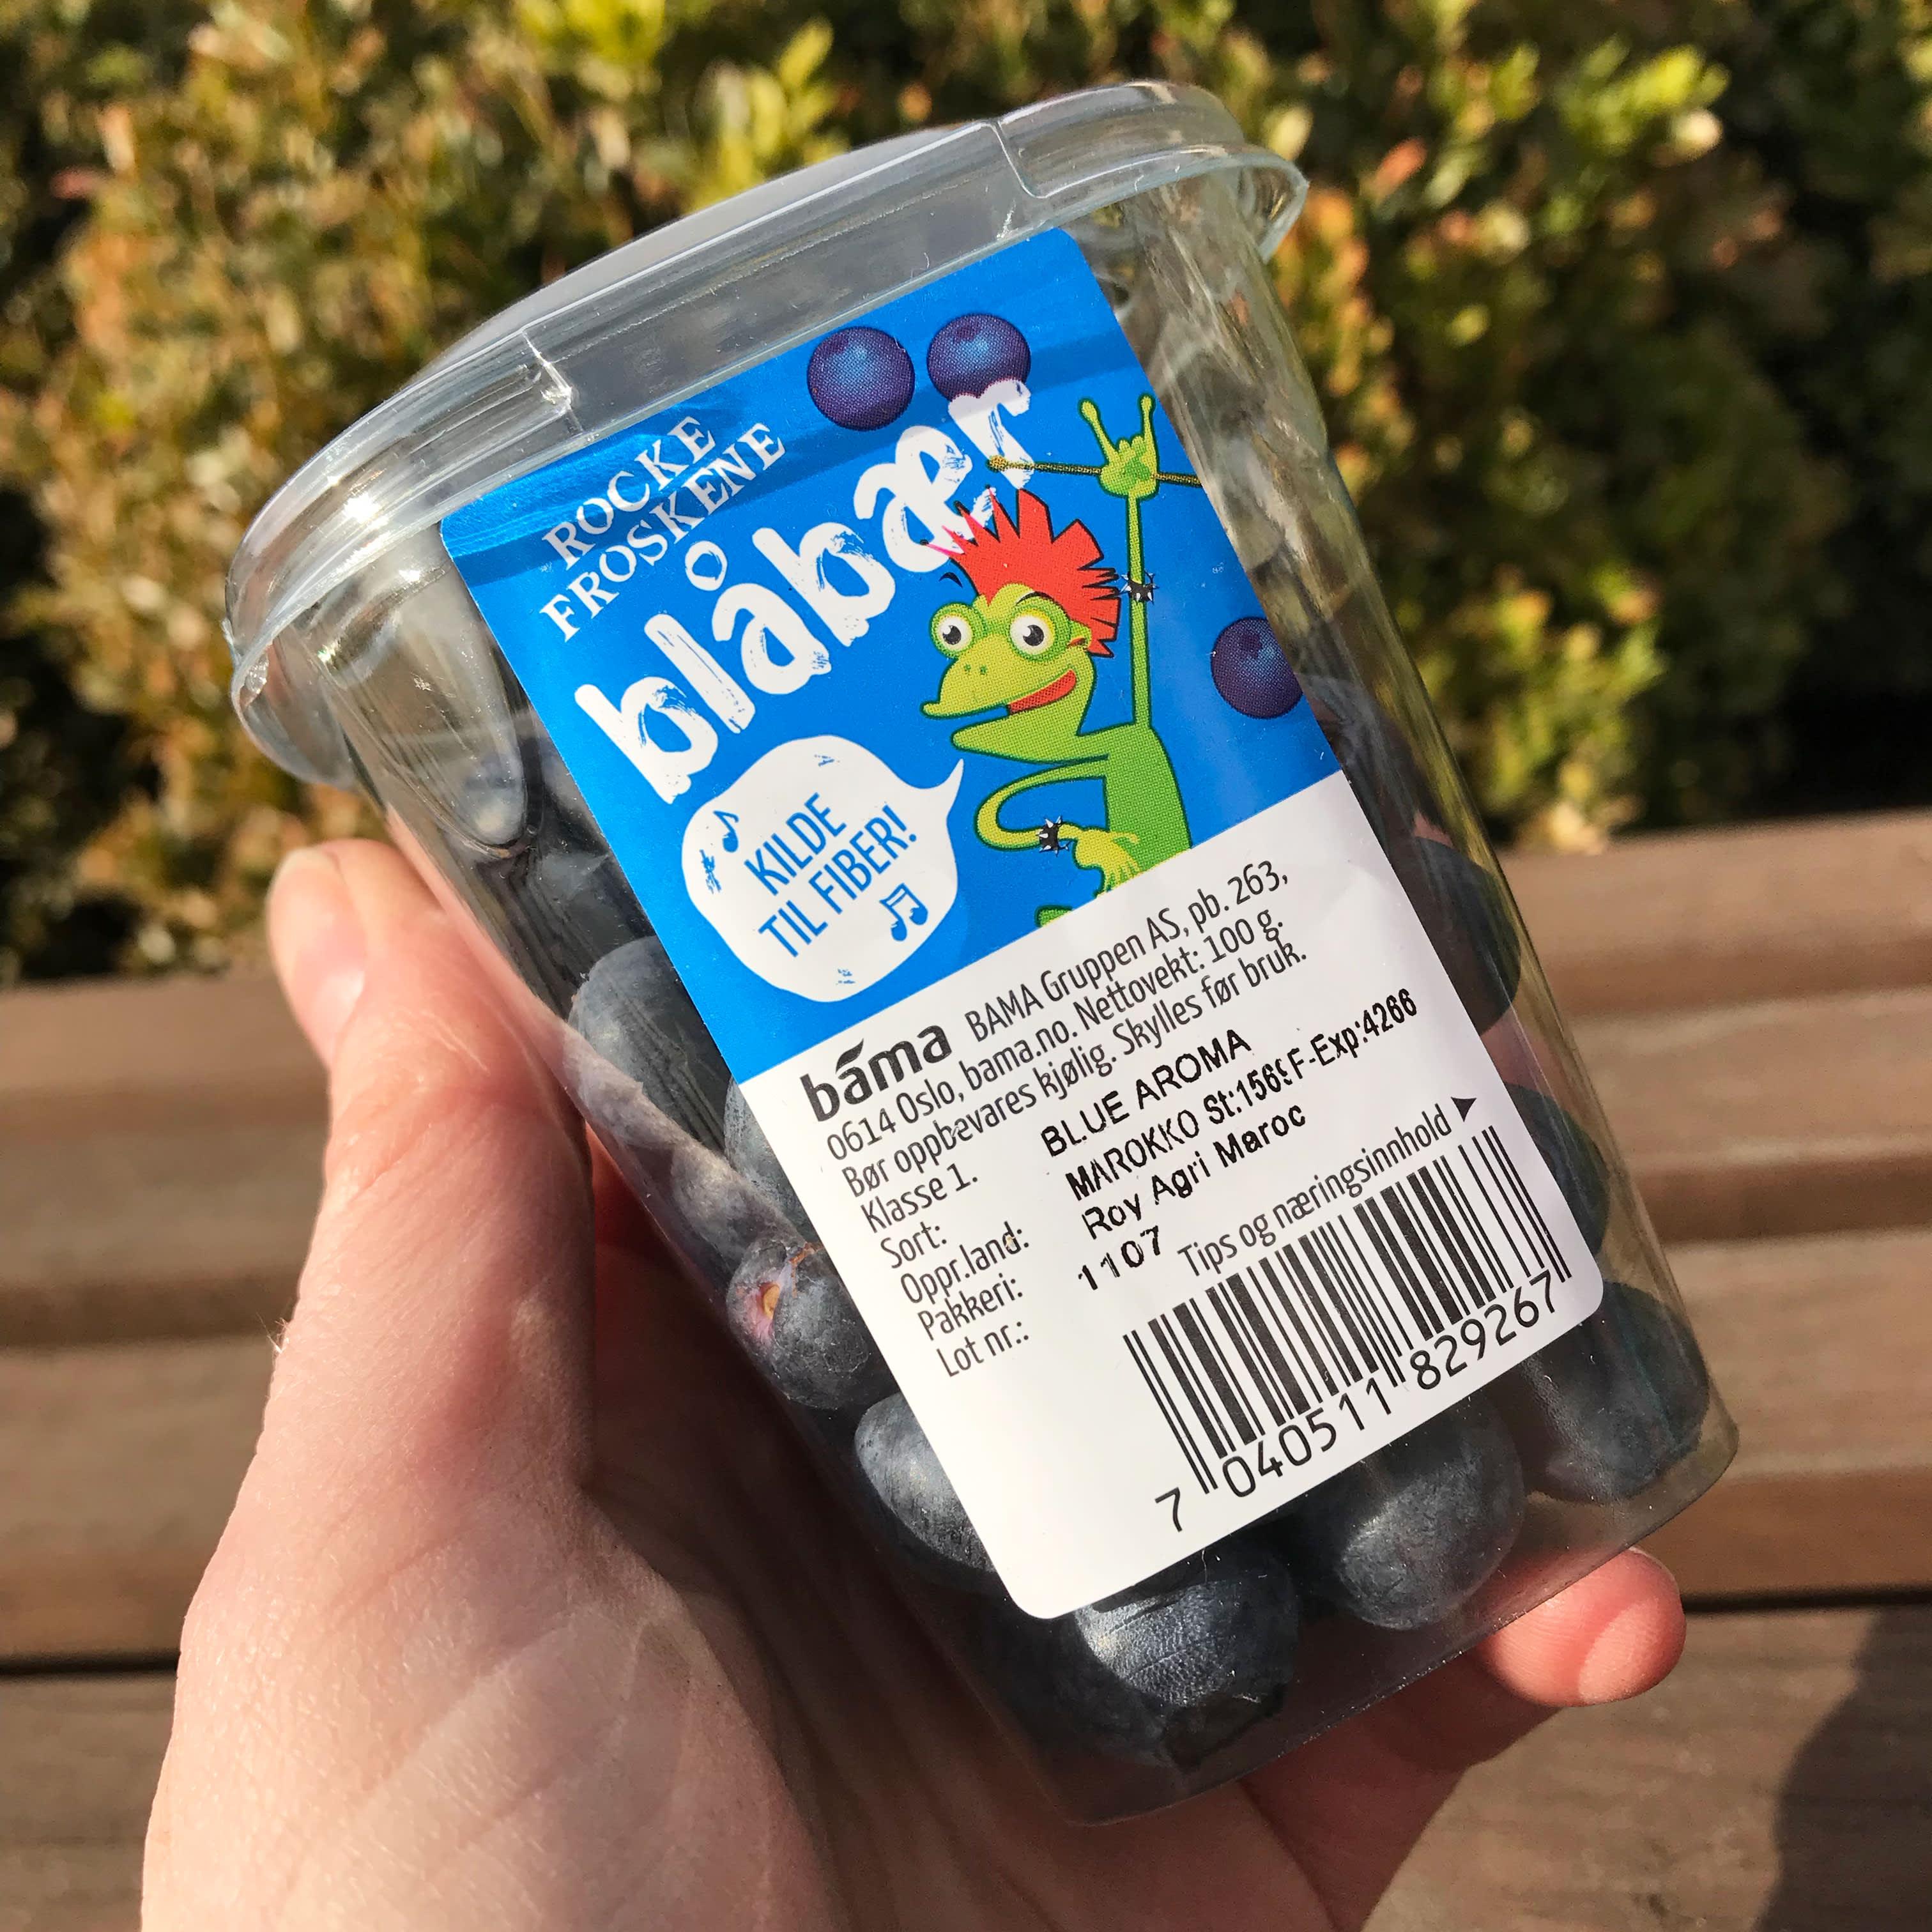 Rockefroskene - blåbær